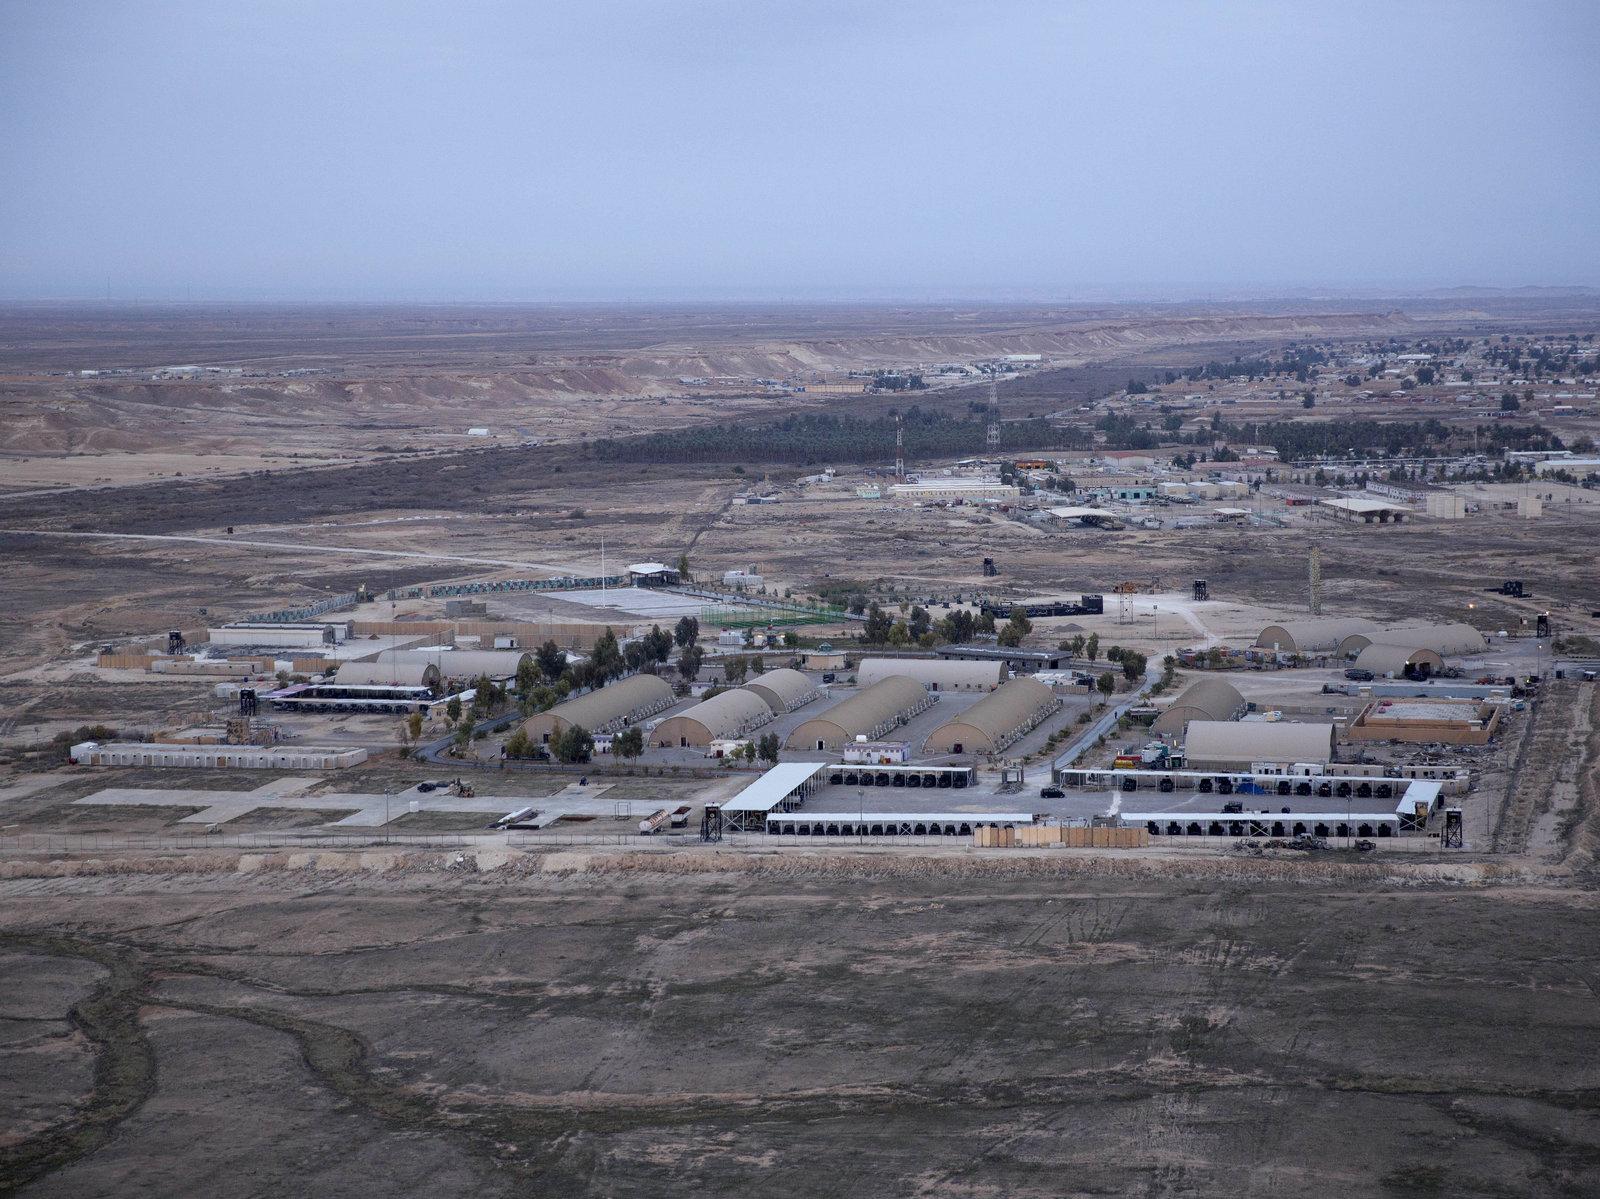 This aerial photo shows Ain al-Assad air base in the western Anbar desert, Iraq, in December 2019. Nasser Nasser/AP